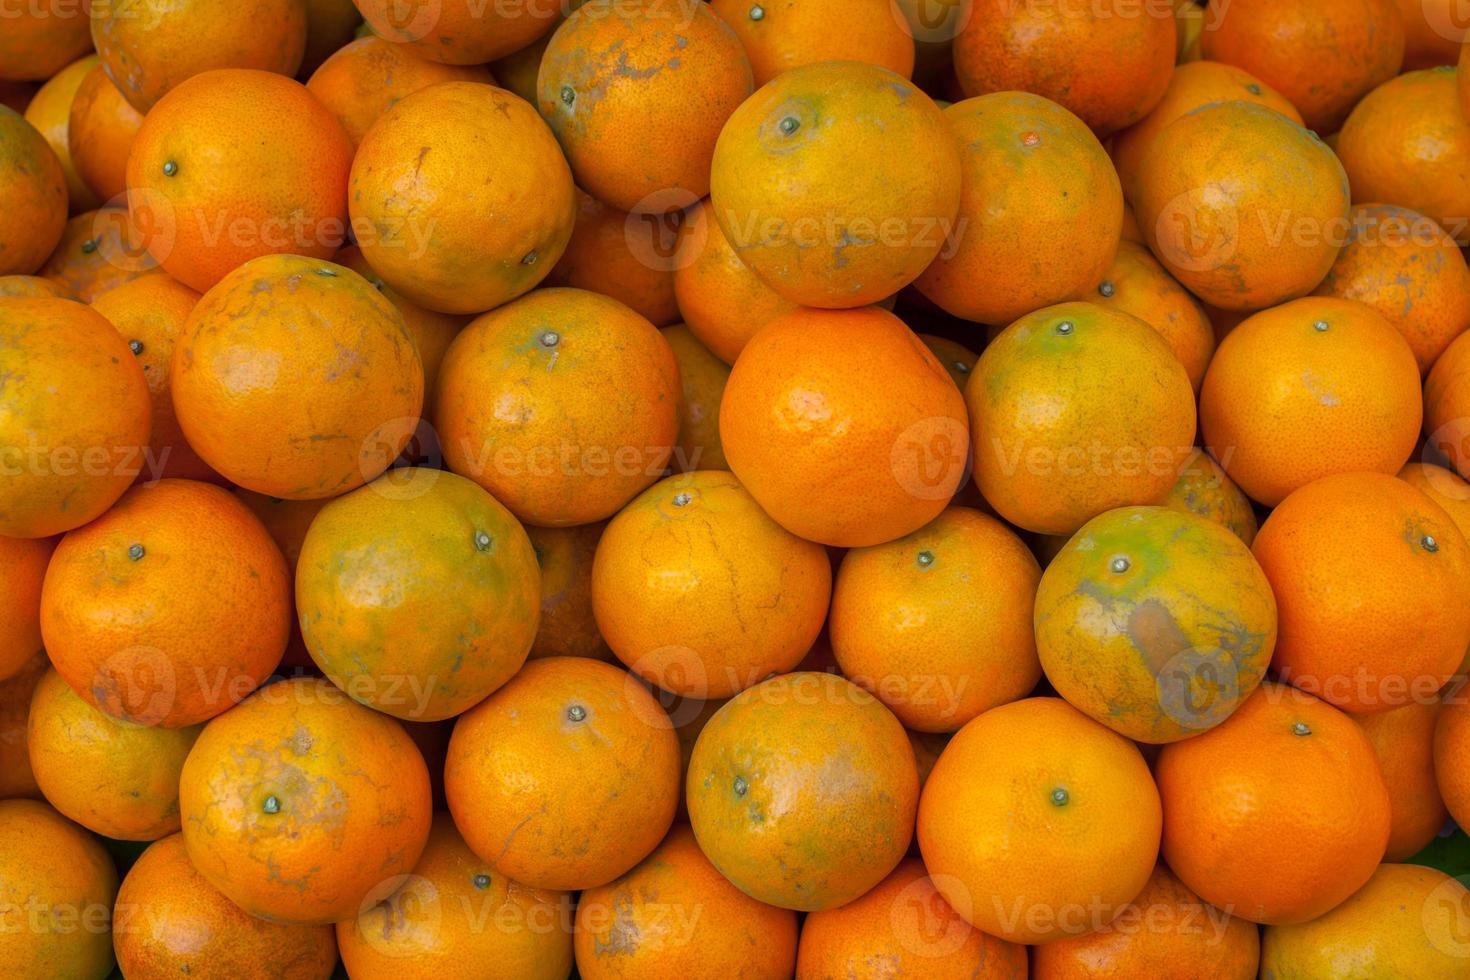 Close-up of natural oranges photo